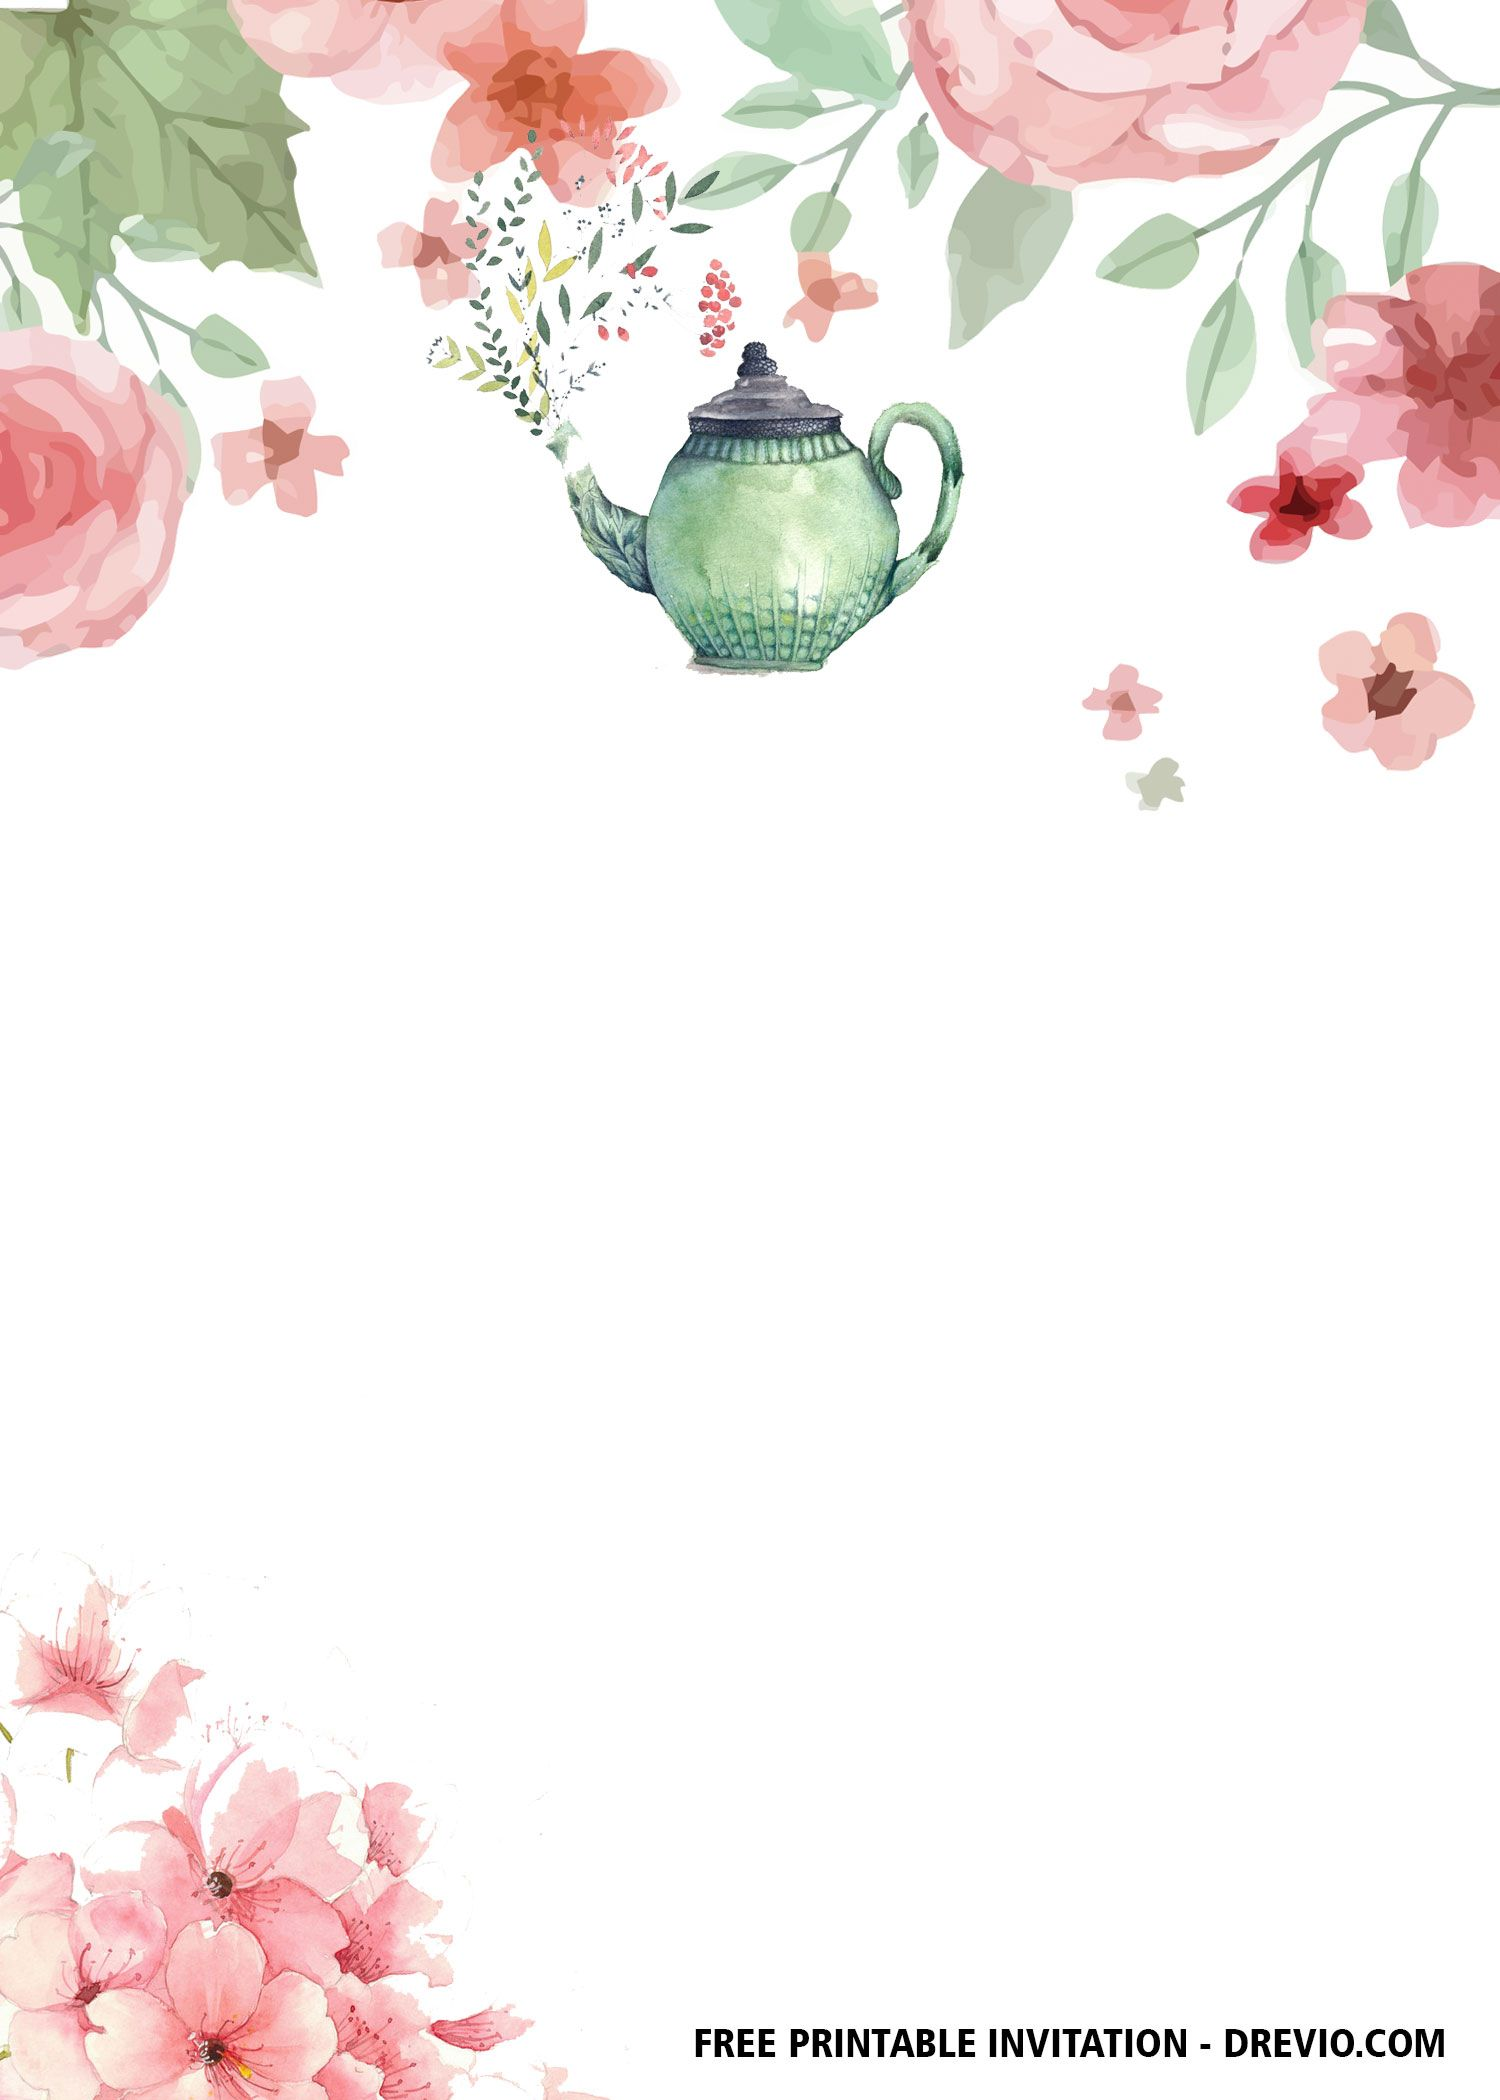 Free Floral Tea Party Invitation Templates Party Invite Template Tea Party Invitations Party Invitations Printable